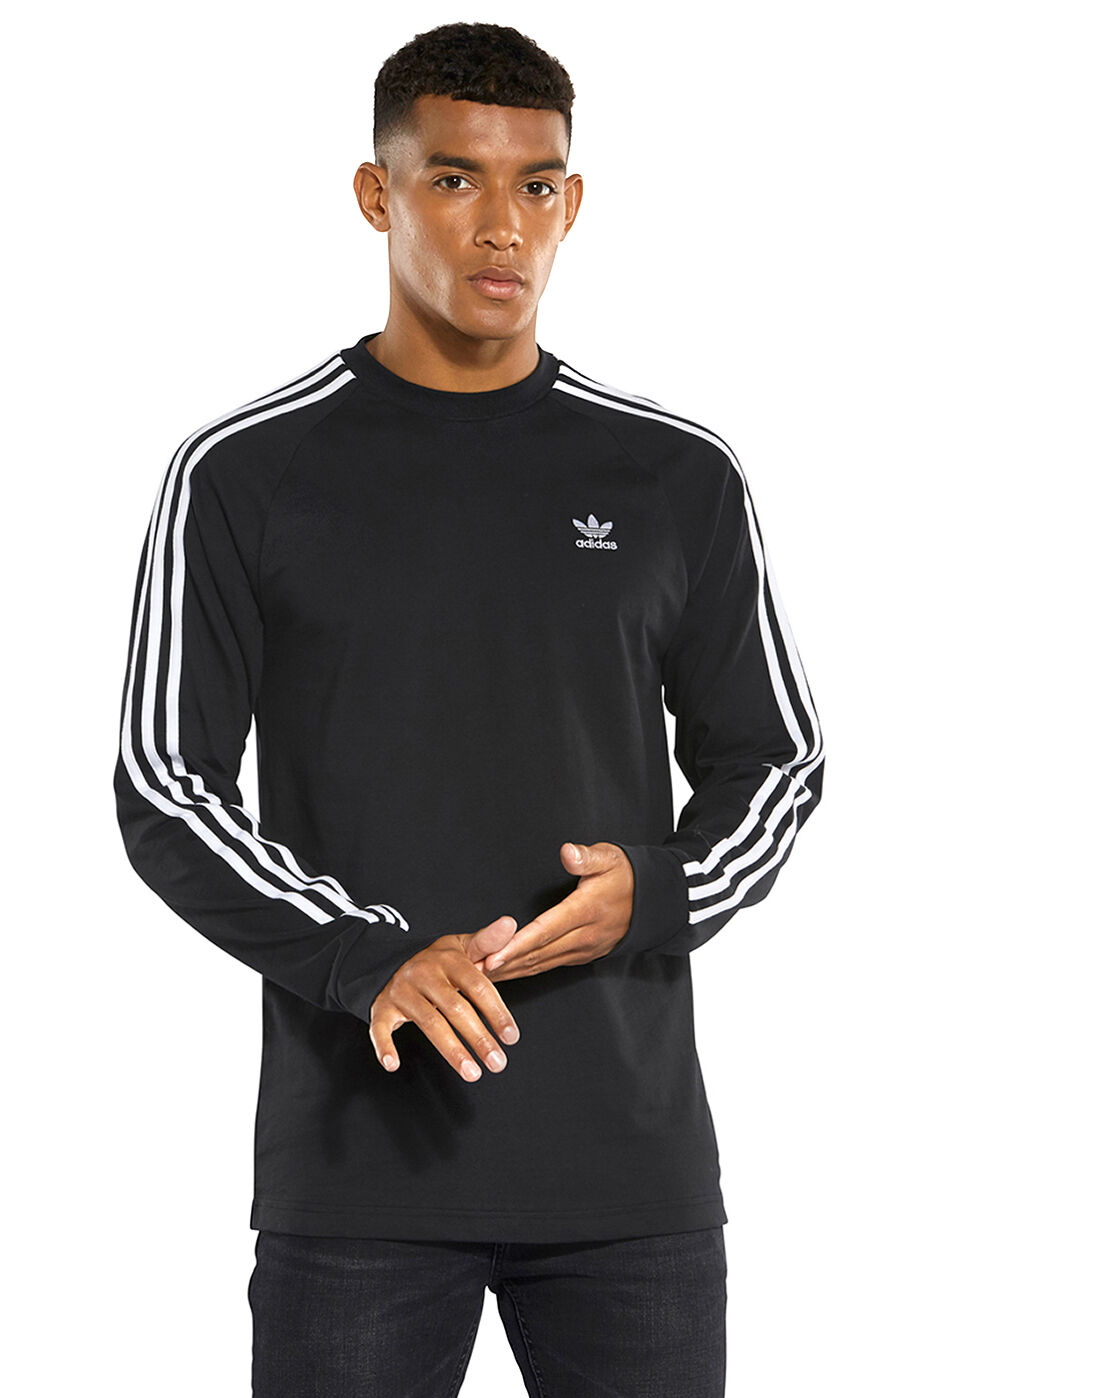 adidas Originals Mens 3-Stripes Long-Sleeve Tee